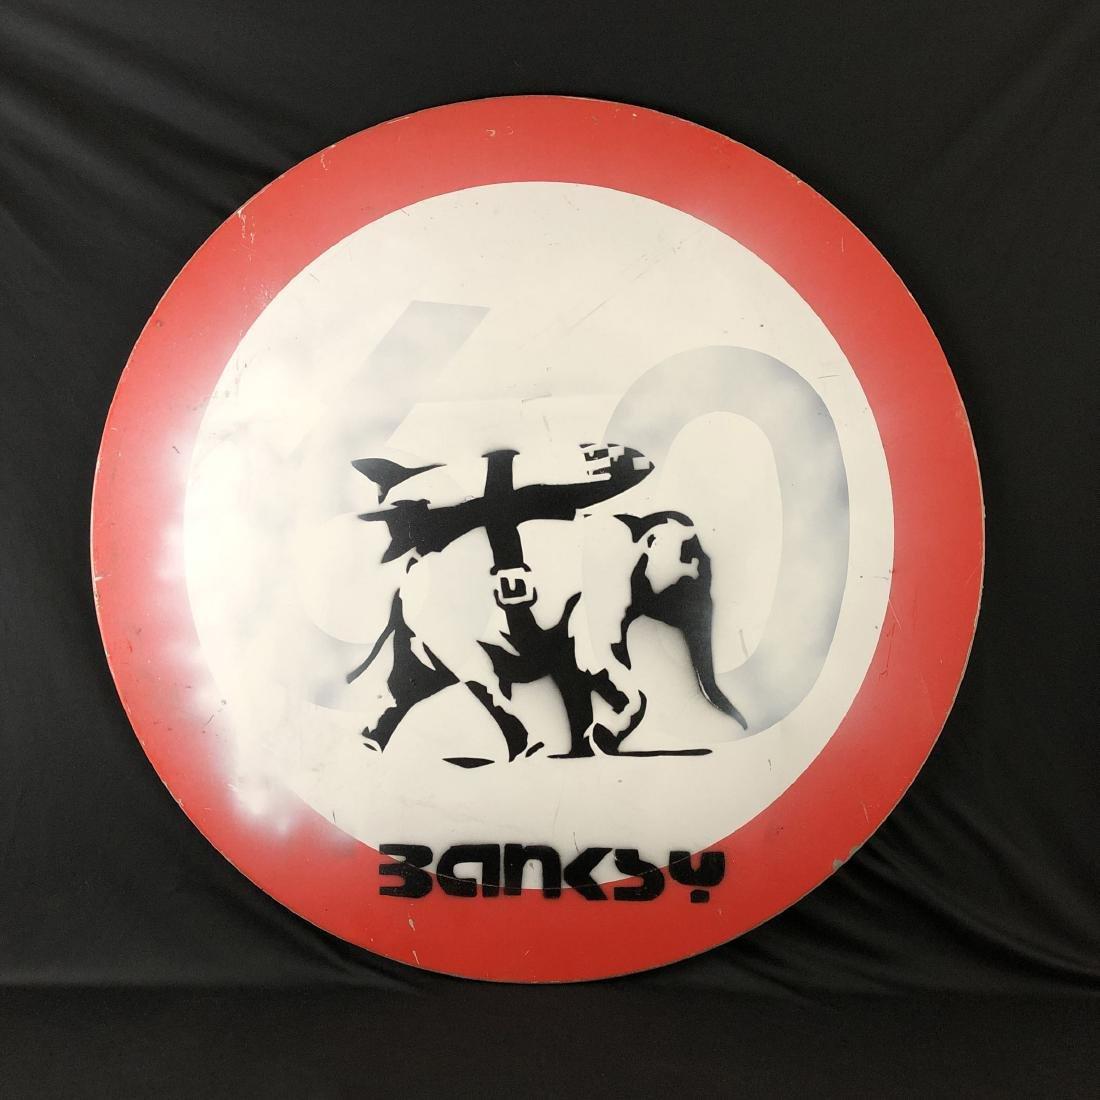 Banksy (United Kingdom, 1974 - ) -- Hand Stenciled